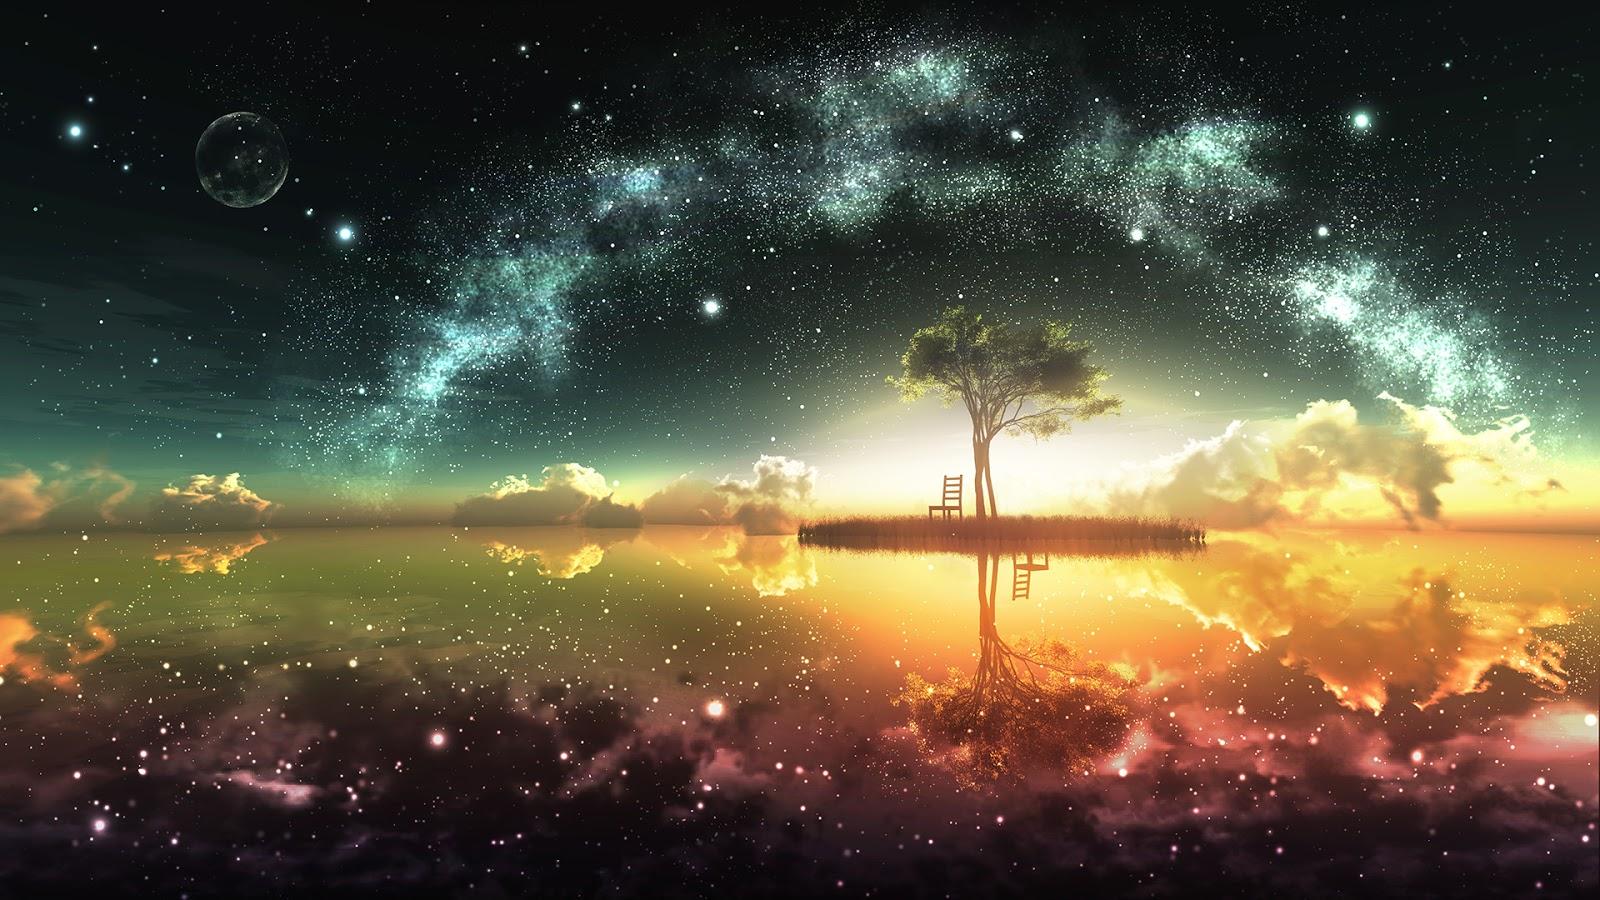 100 4k Galaxy Wallpapers Hd For Desktop 2020 We 7